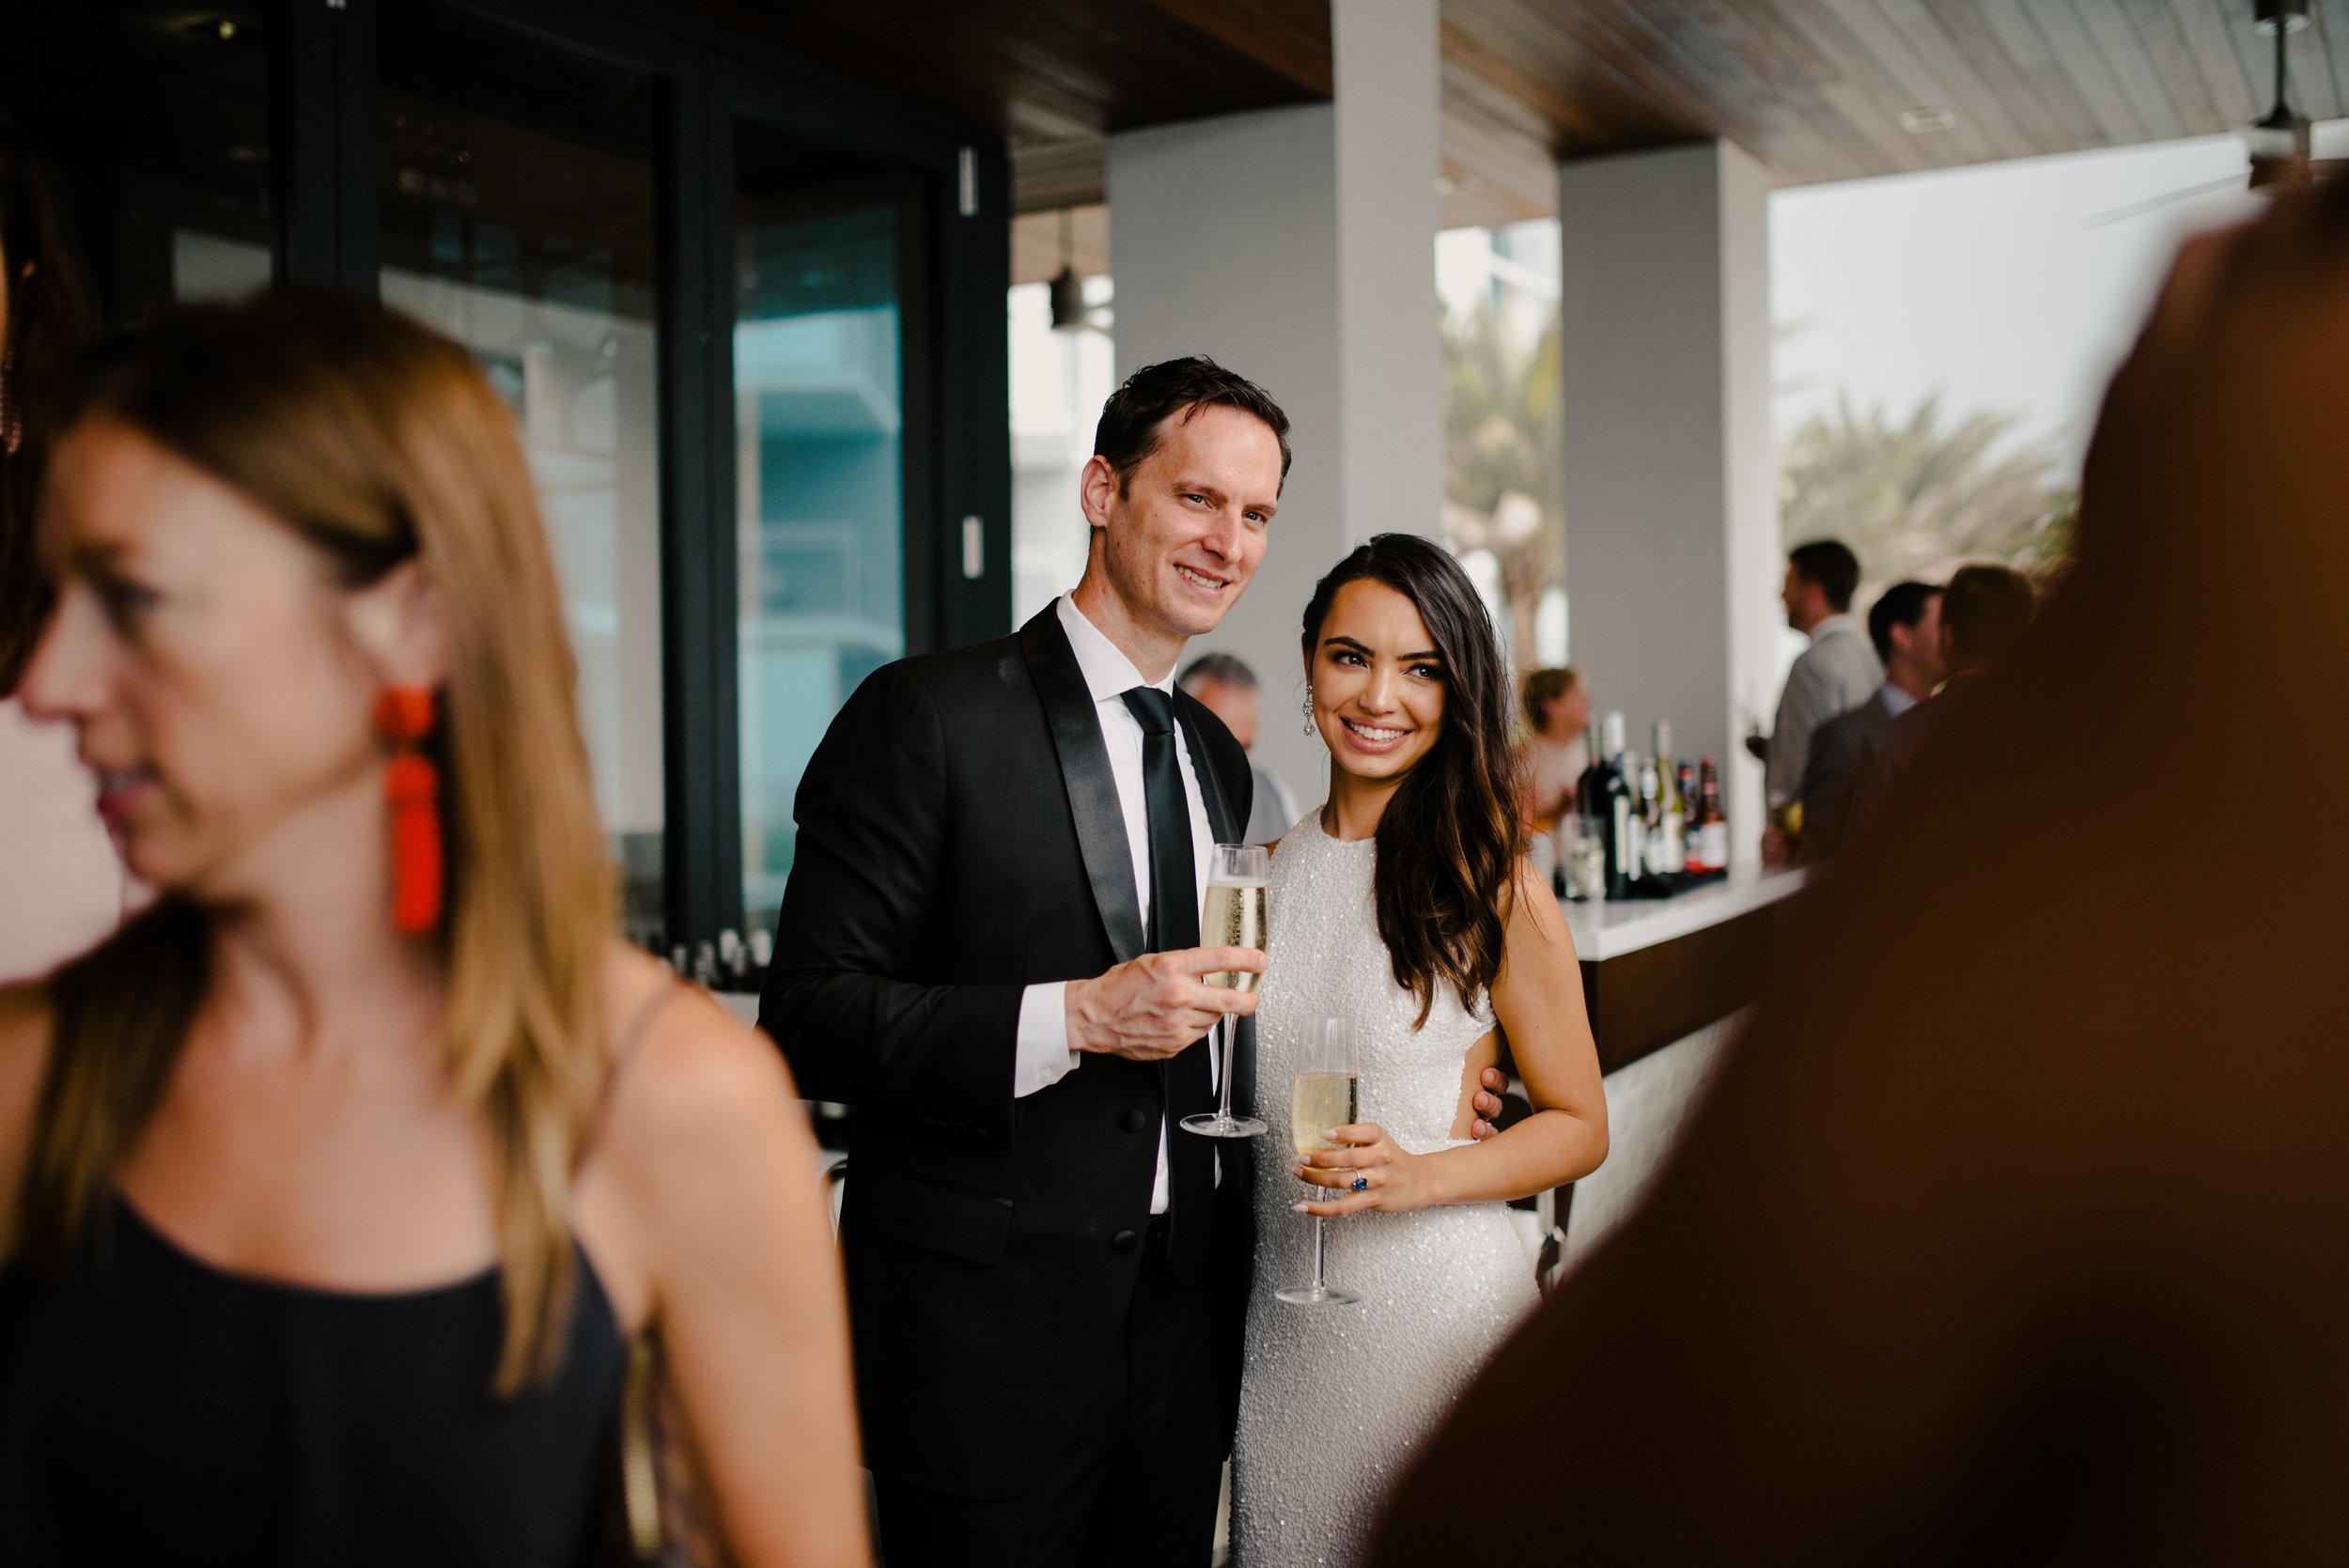 Stephen-Jennier-Longboat-Key-Florida-Wedding-235.jpg